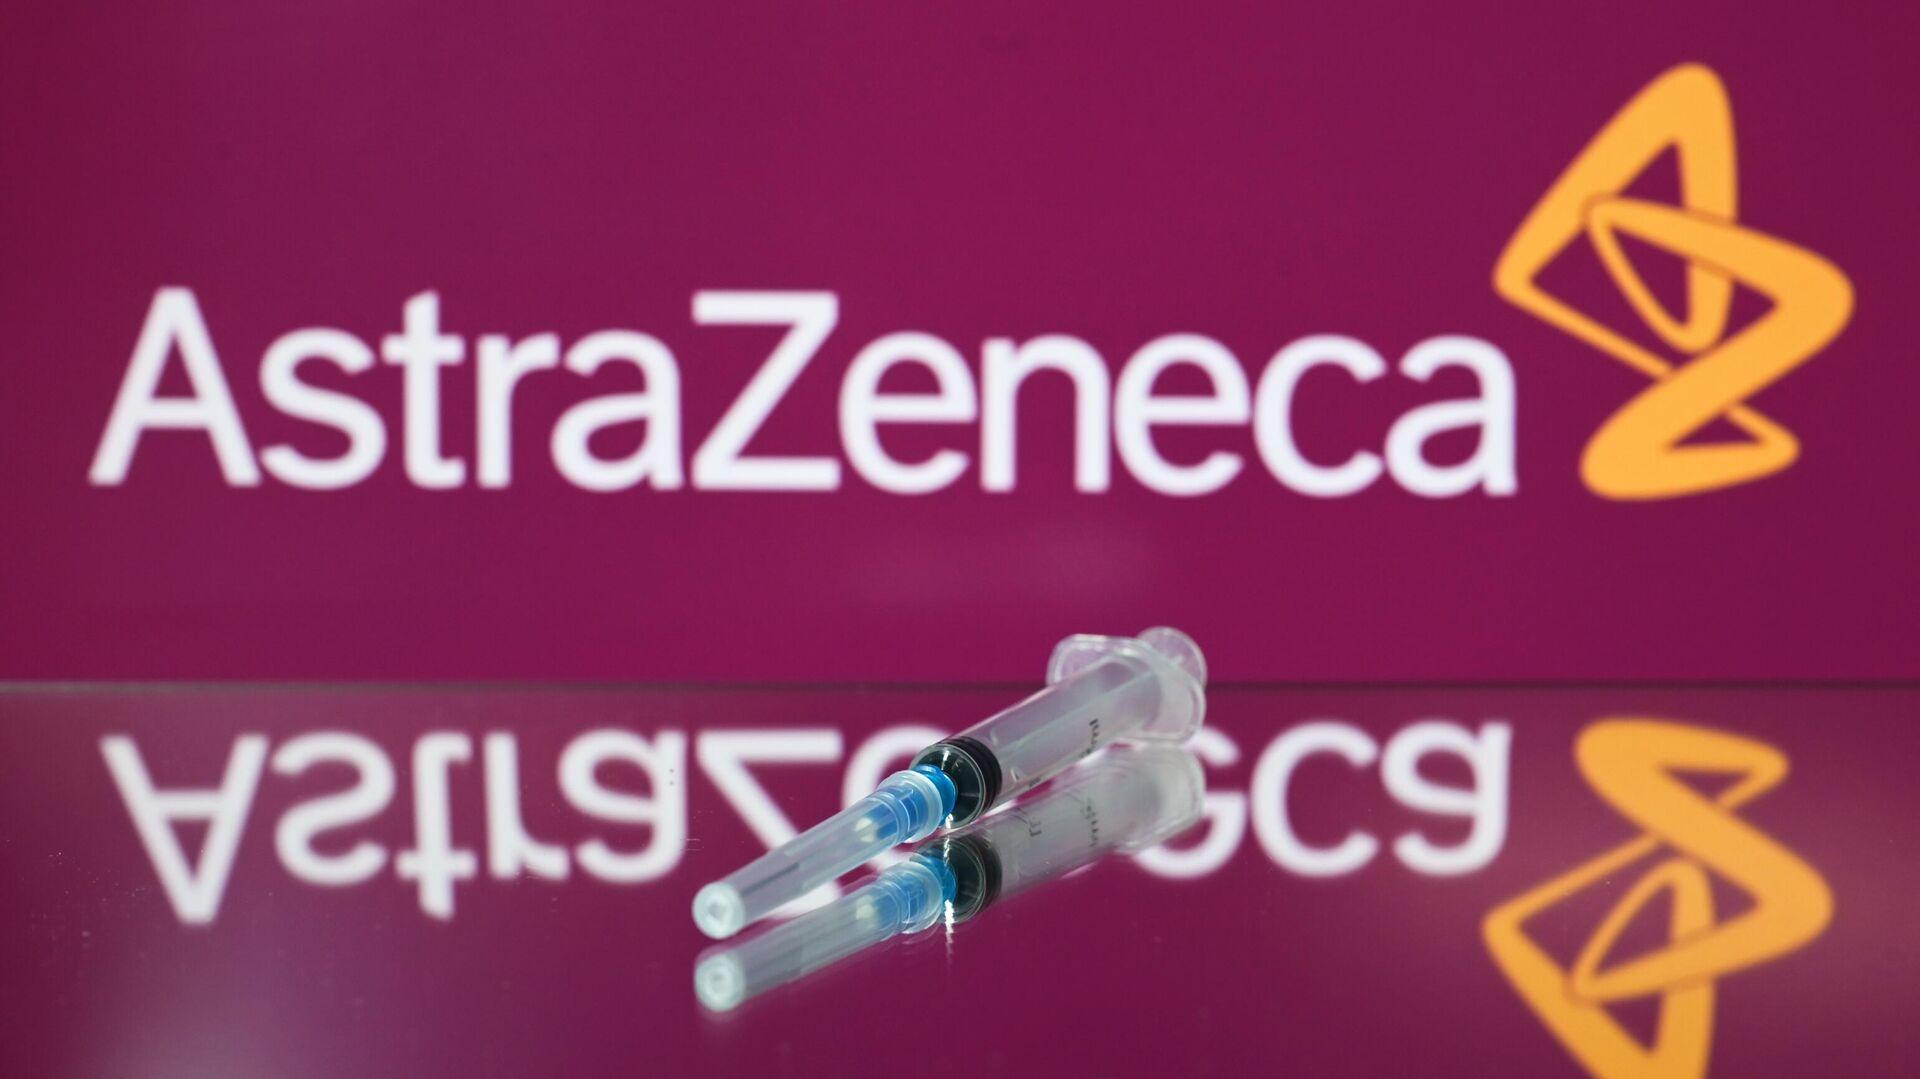 Вакцина от коронавируса британо-шведской компании AstraZeneca и Оксфордского университета - РИА Новости, 1920, 23.02.2021